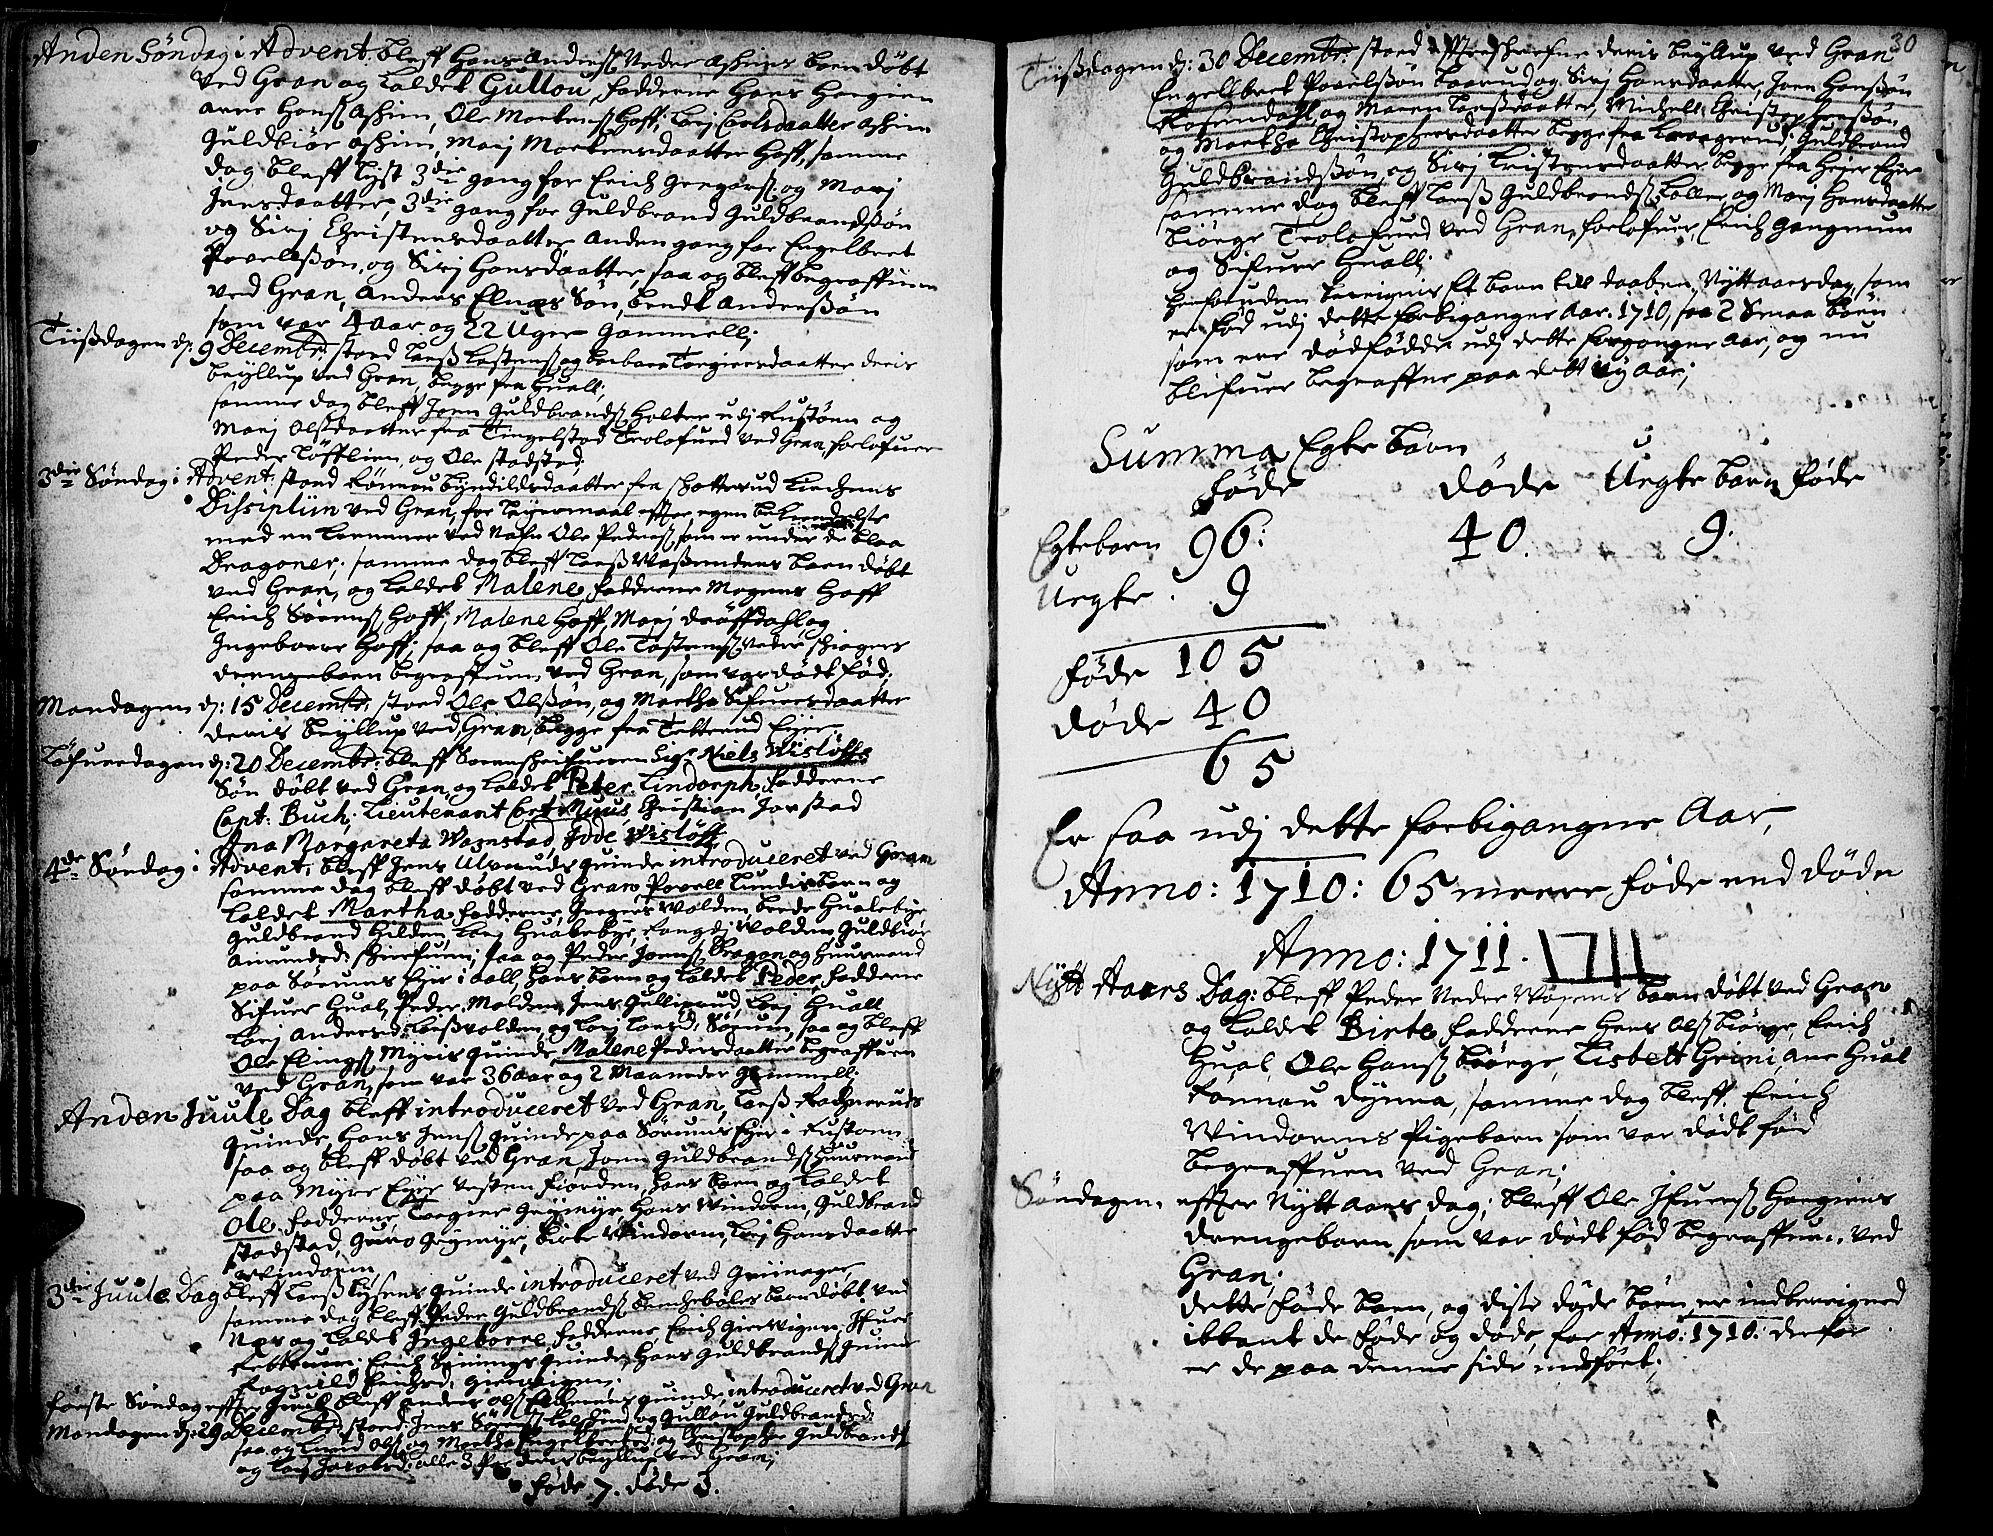 SAH, Gran prestekontor, Ministerialbok nr. 1, 1707-1731, s. 30